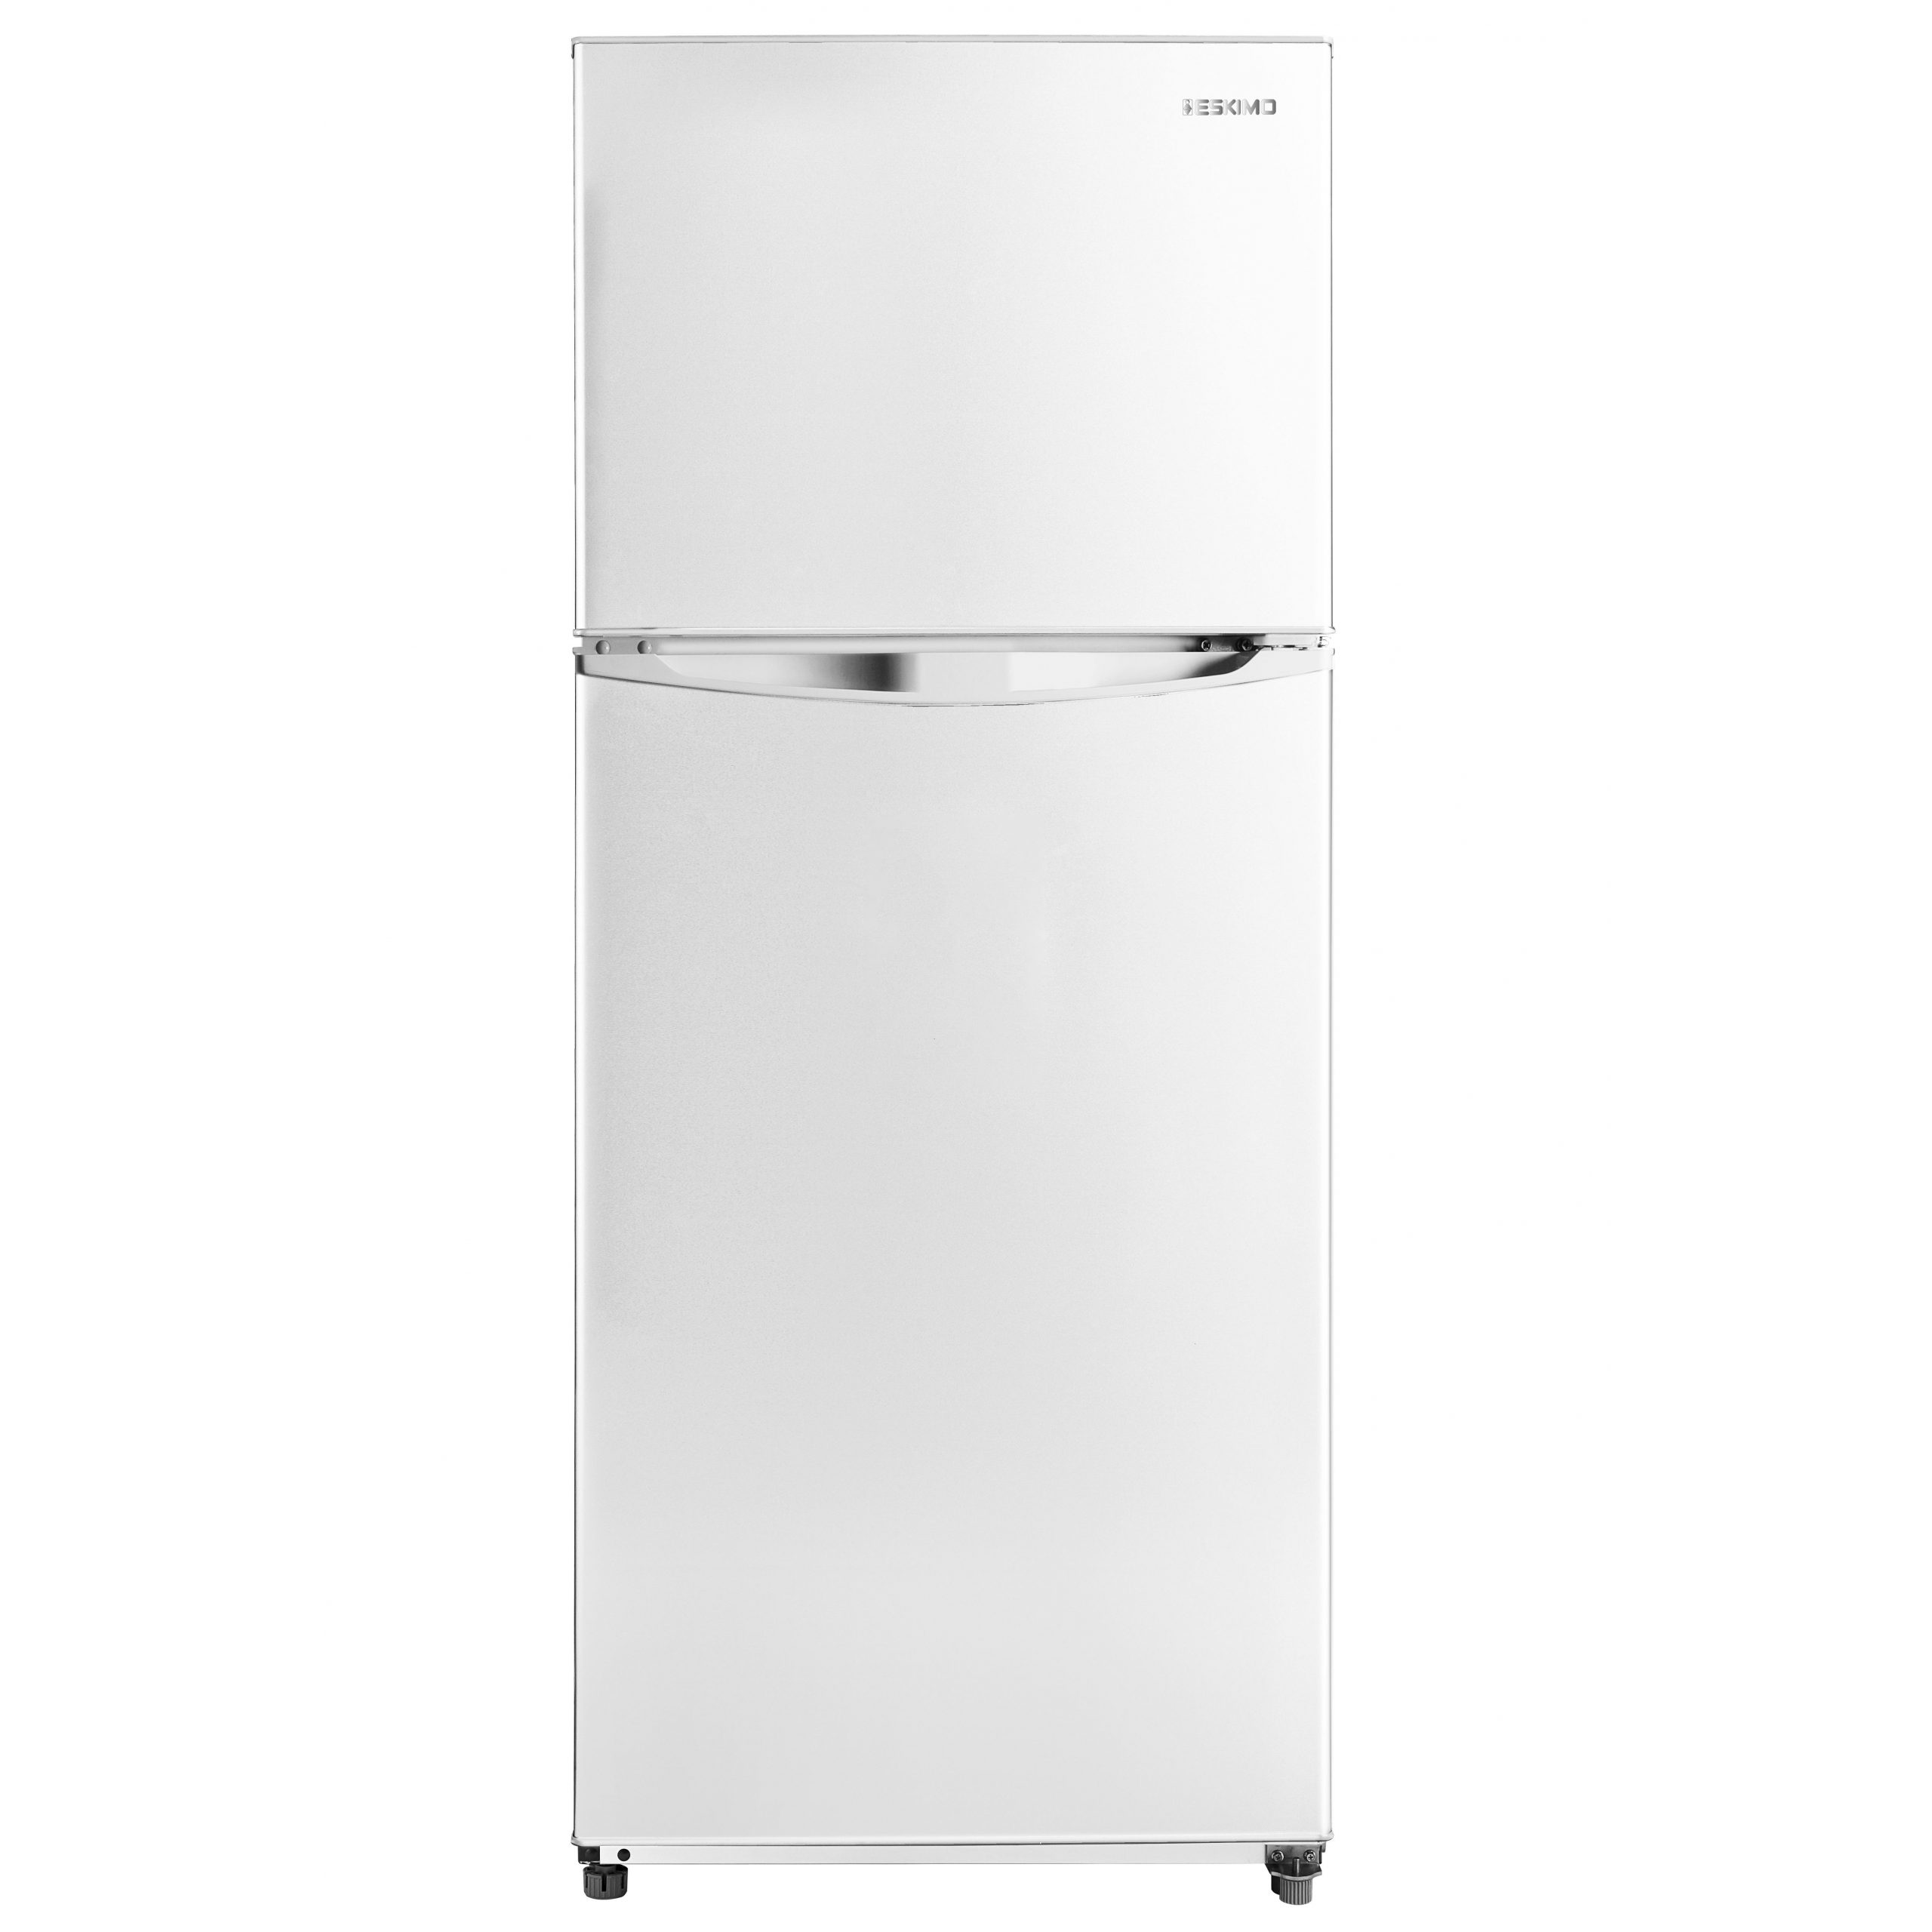 Eskimo Δίπορτο Ψυγείο ES 8375 NF W